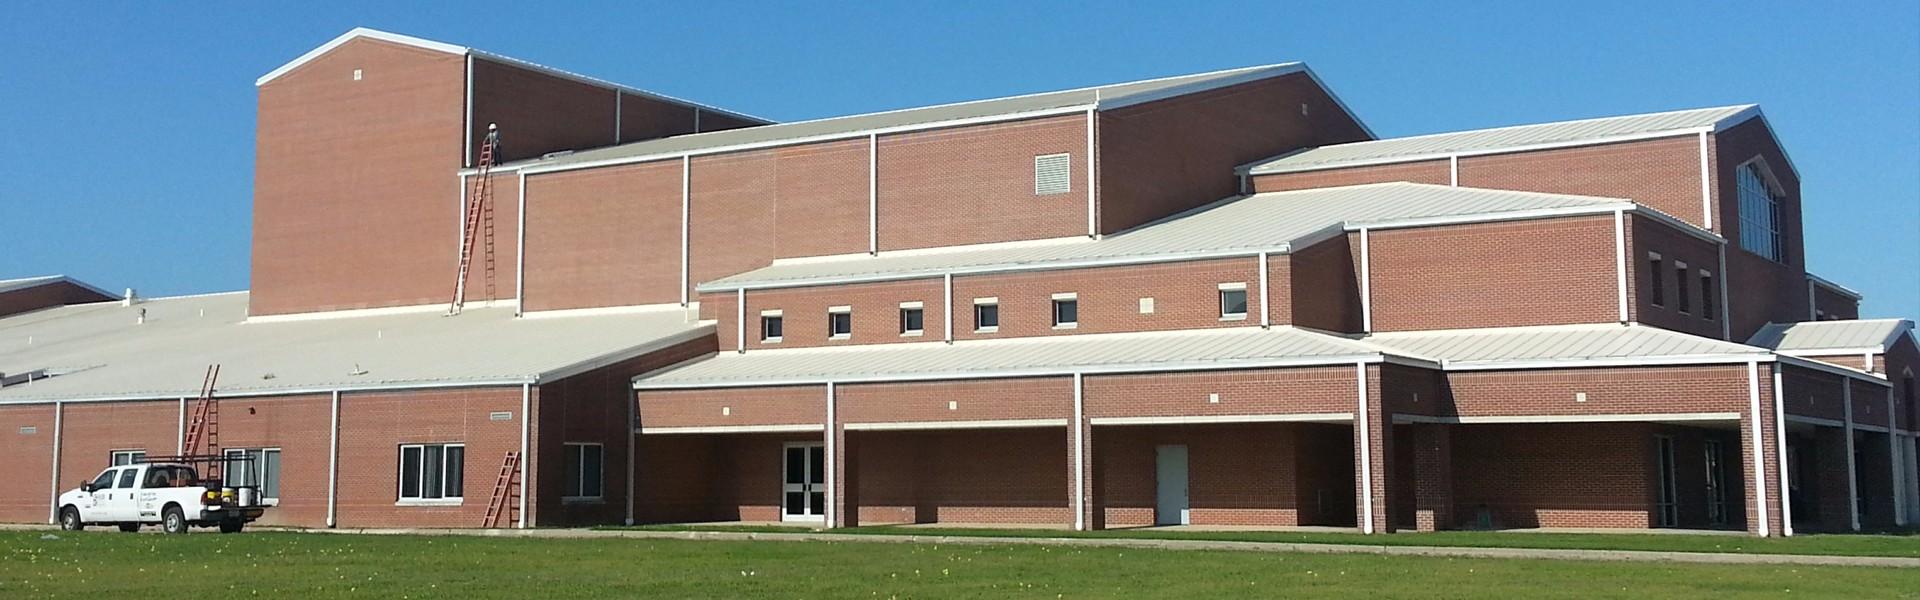 Groesbeck High School – Groesbeck, TX